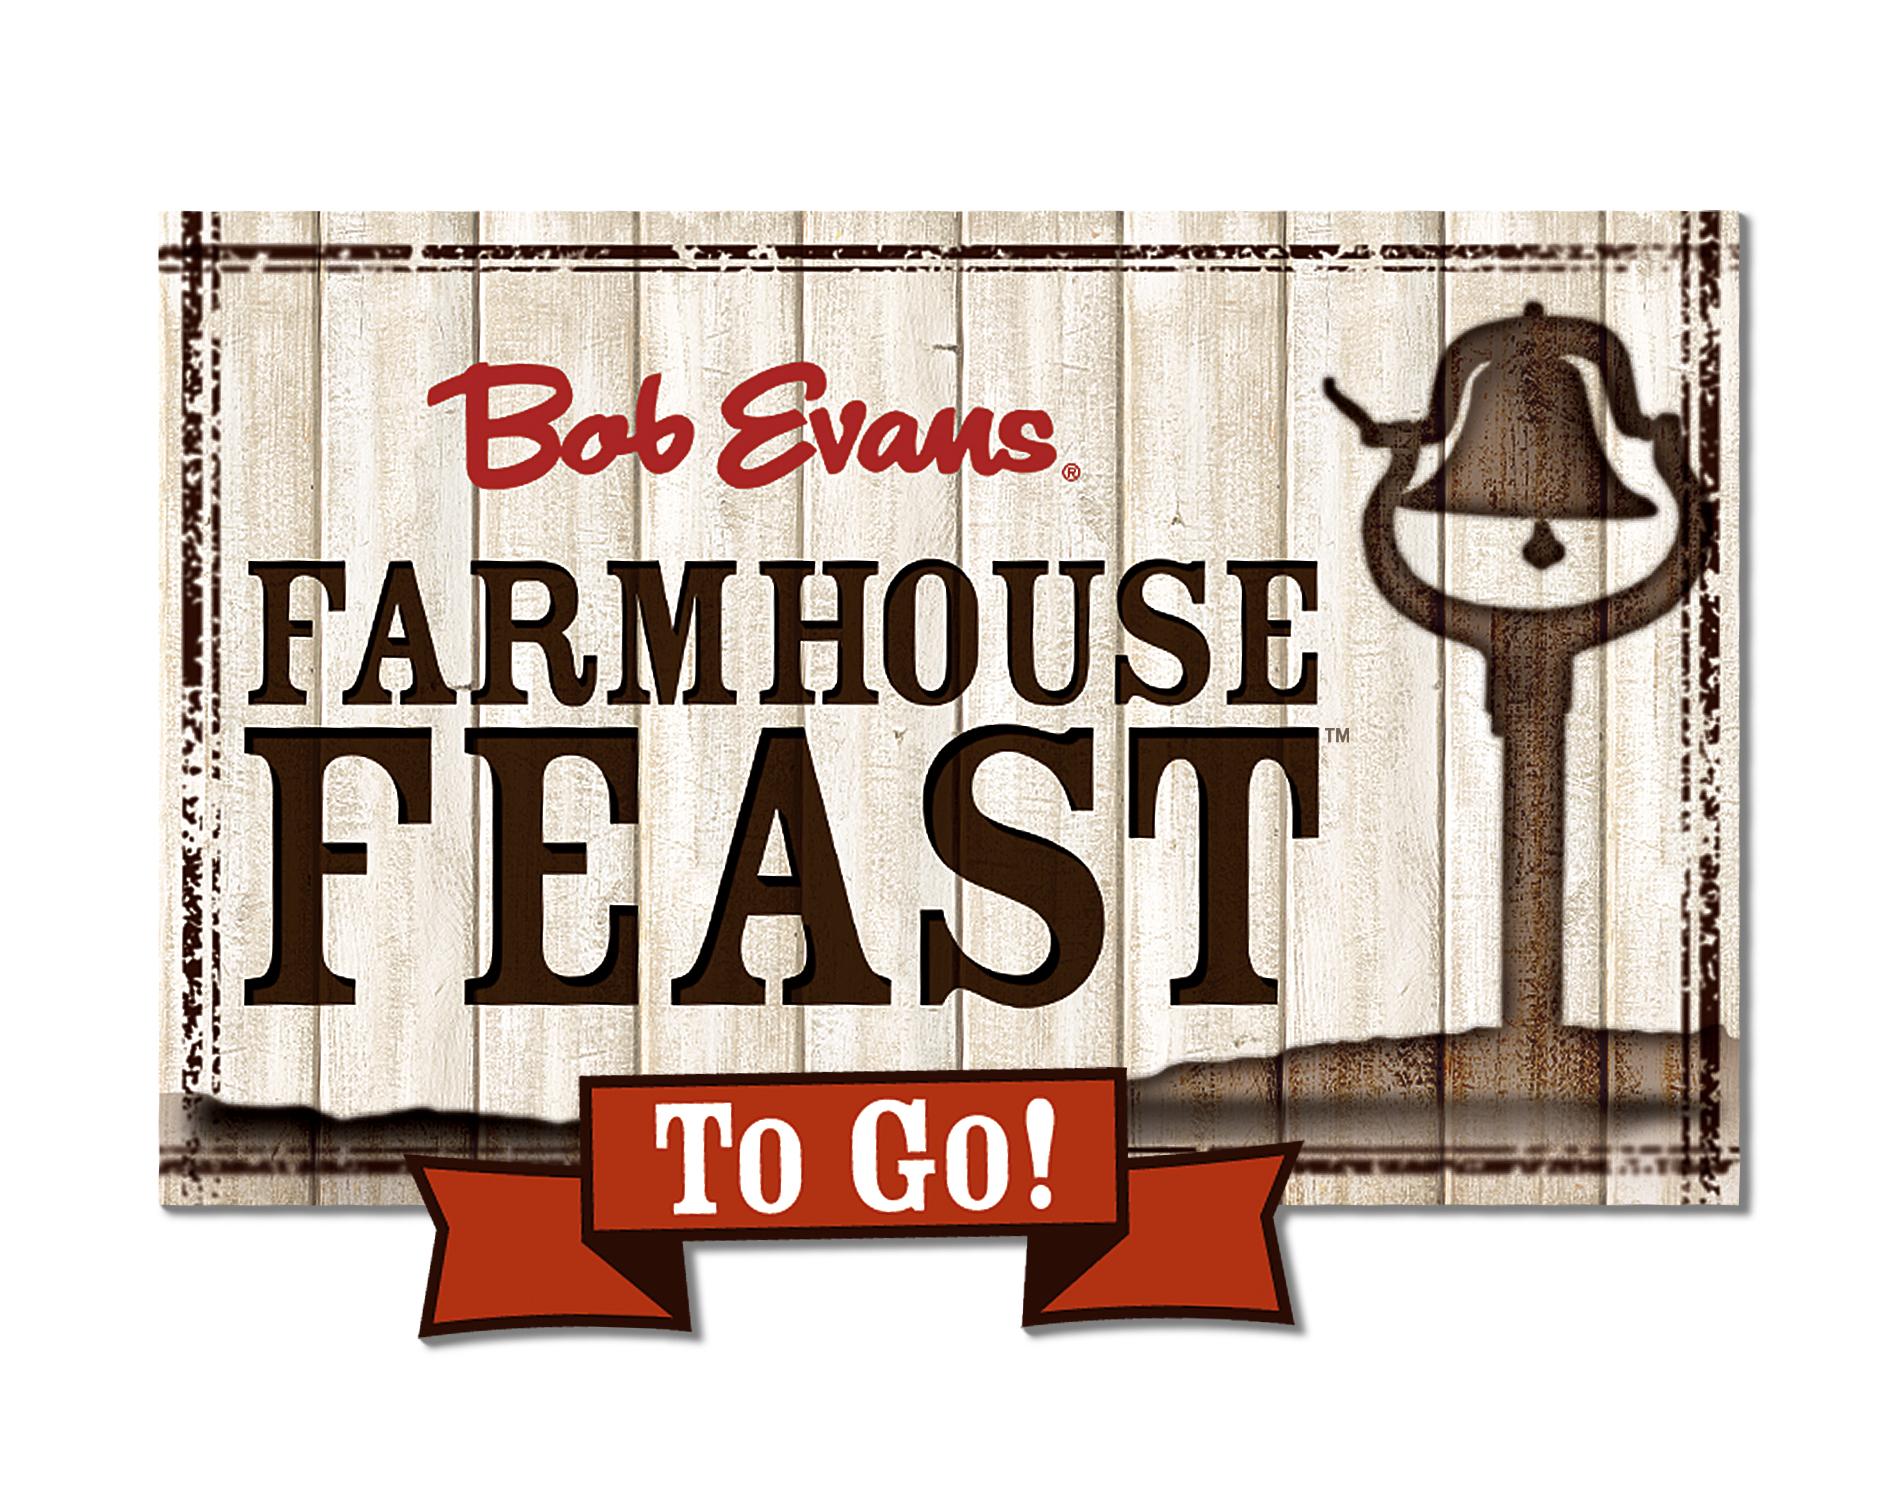 30 Beautiful Bob Evans Thanksgiving Farmhouse Feast